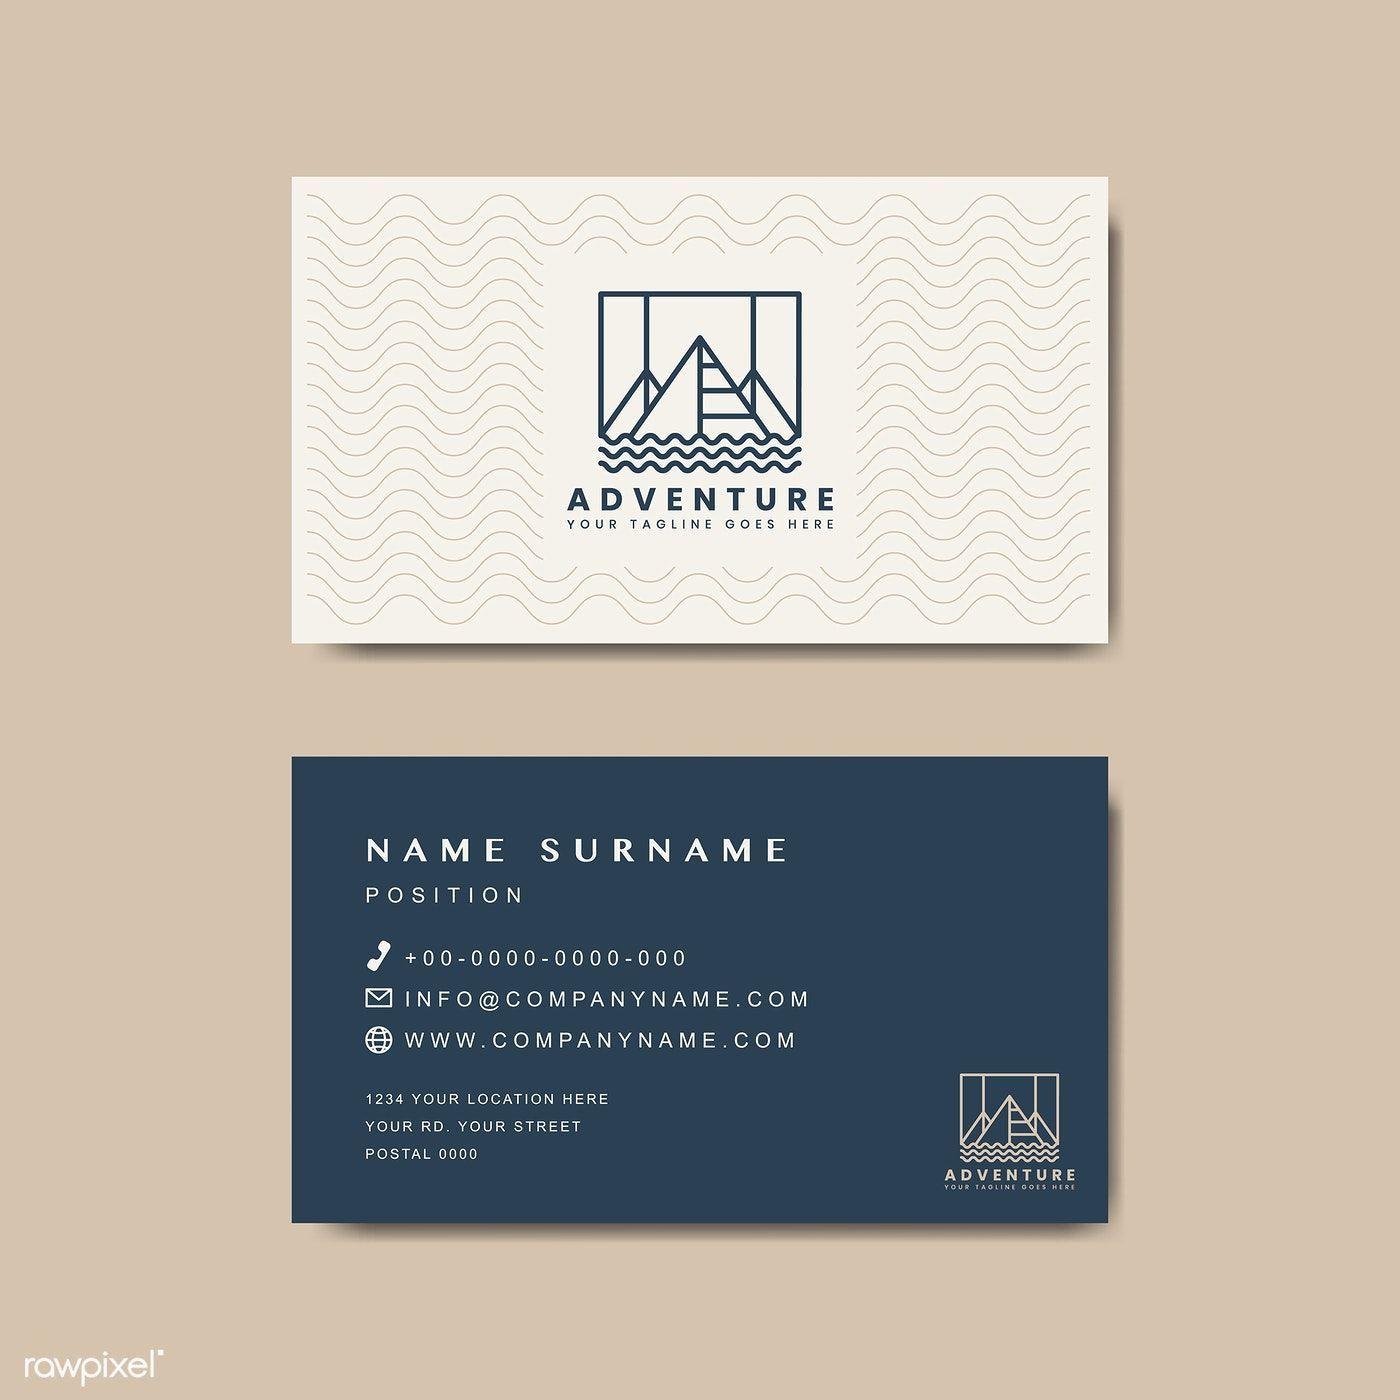 005 Simple Minimal Busines Card Template Free Download Picture  Design CoreldrawFull